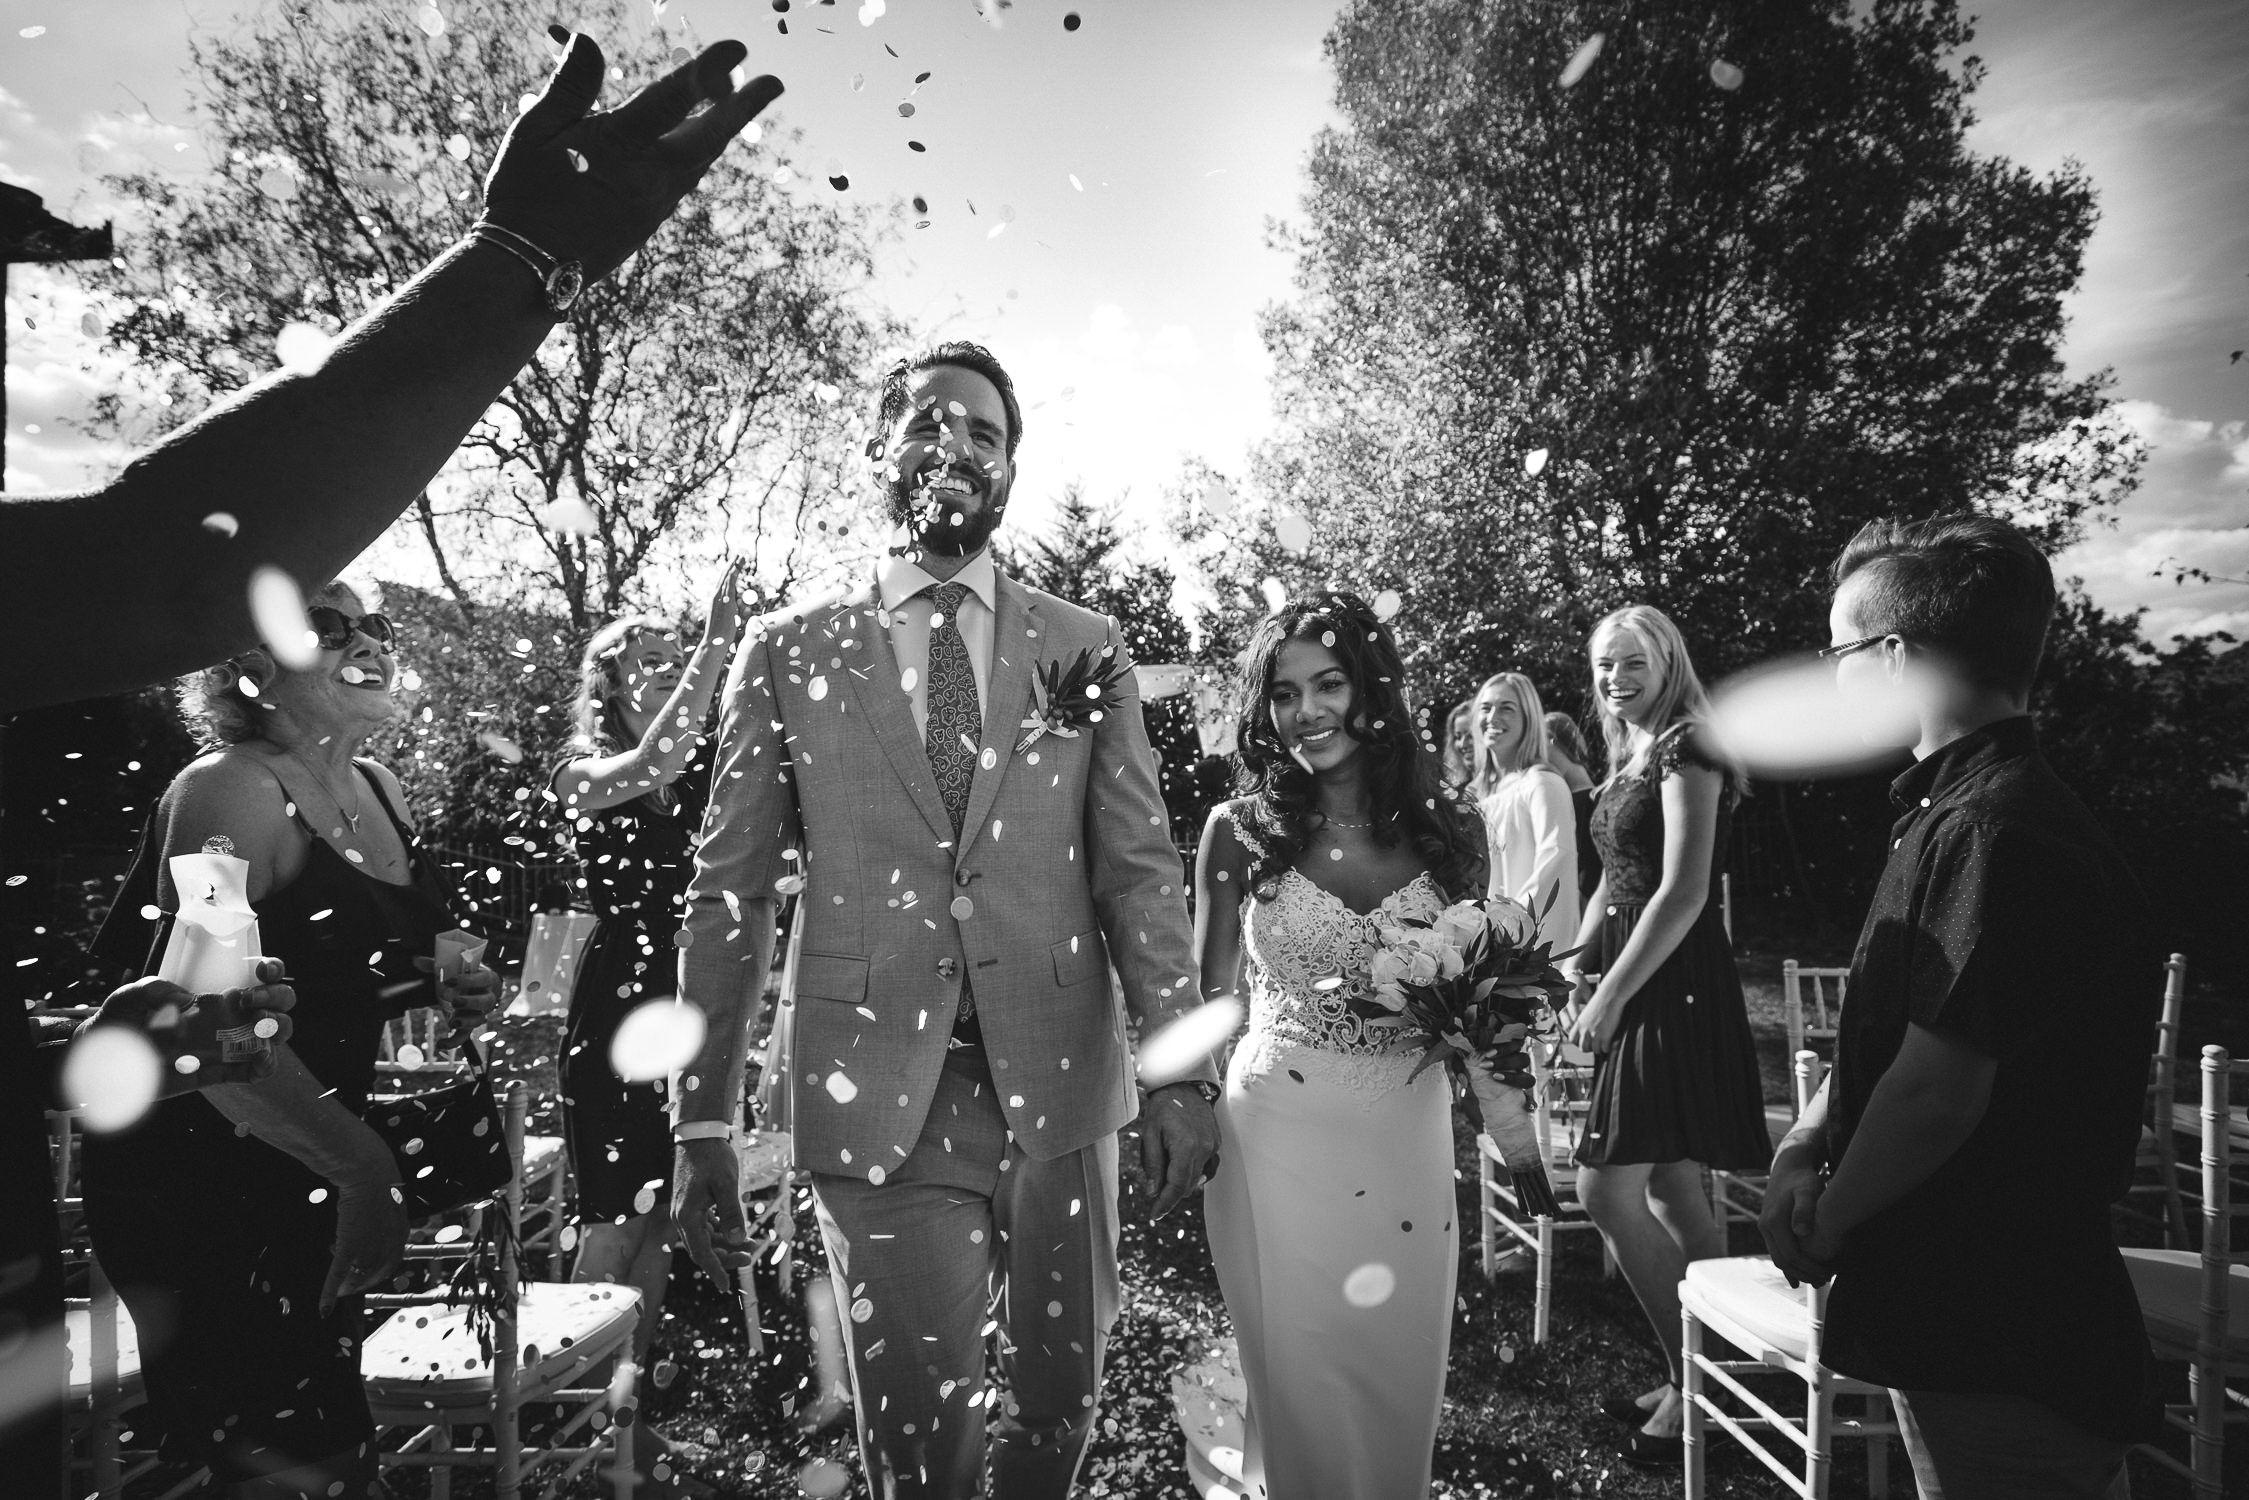 best amsterdam wedding photographer mark hadden - just married couple in confetti